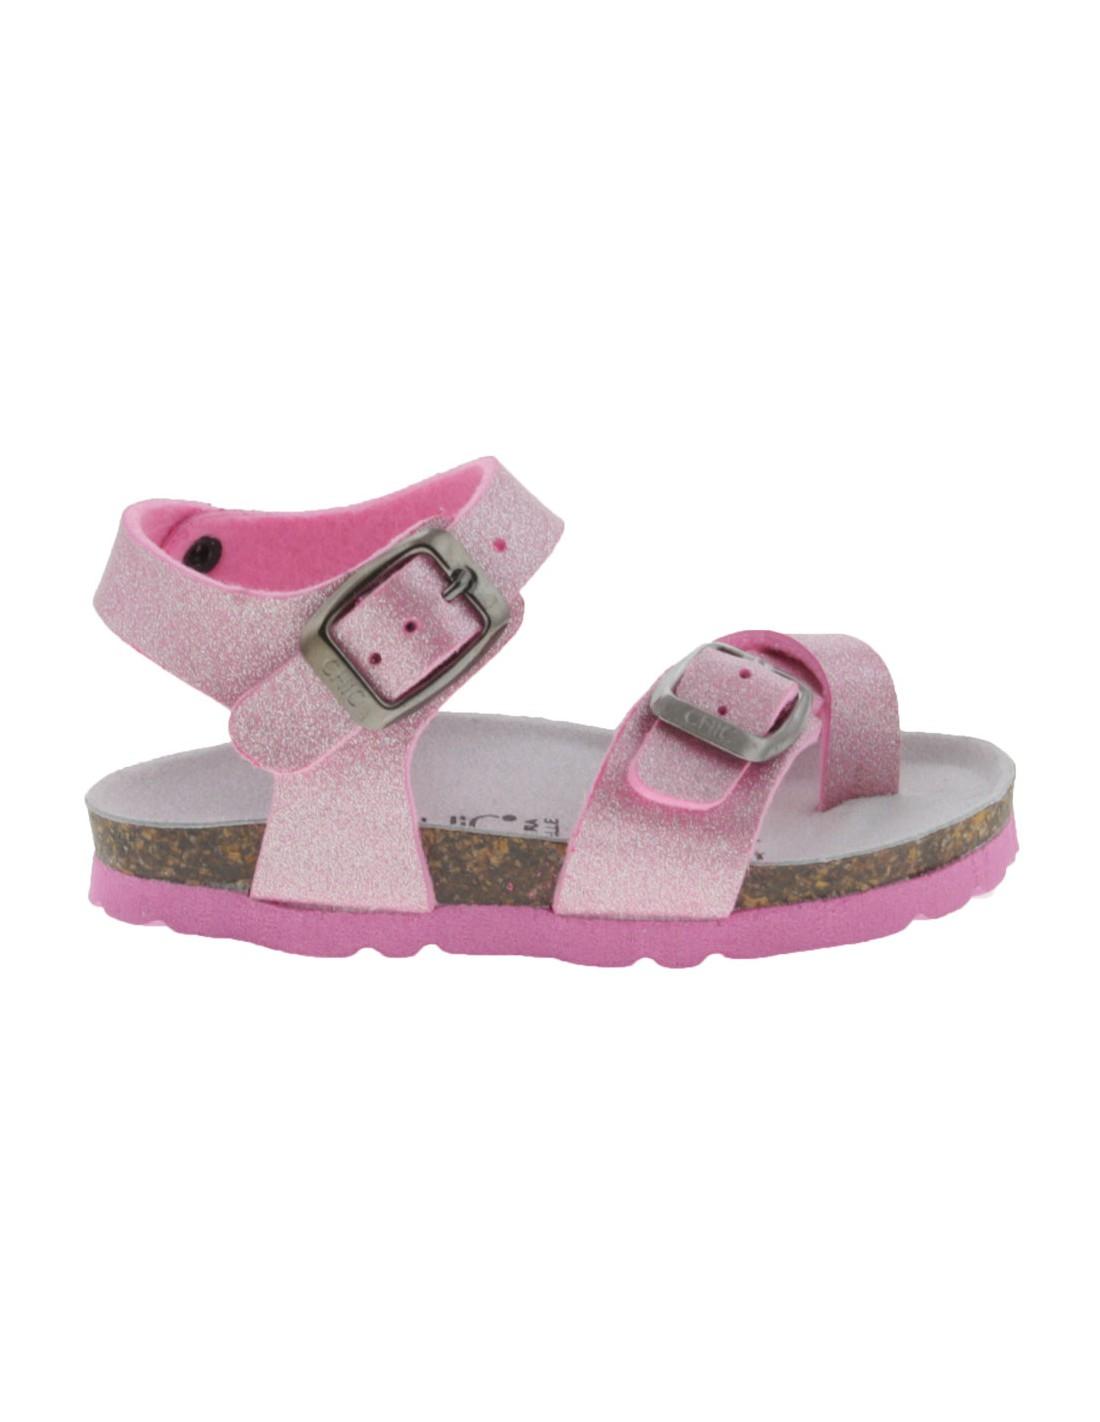 Bambina Glitter Sandalo Rosa Sandalo Biochic Glitter Biochic Bambina Sandalo Rosa 80Nnwm